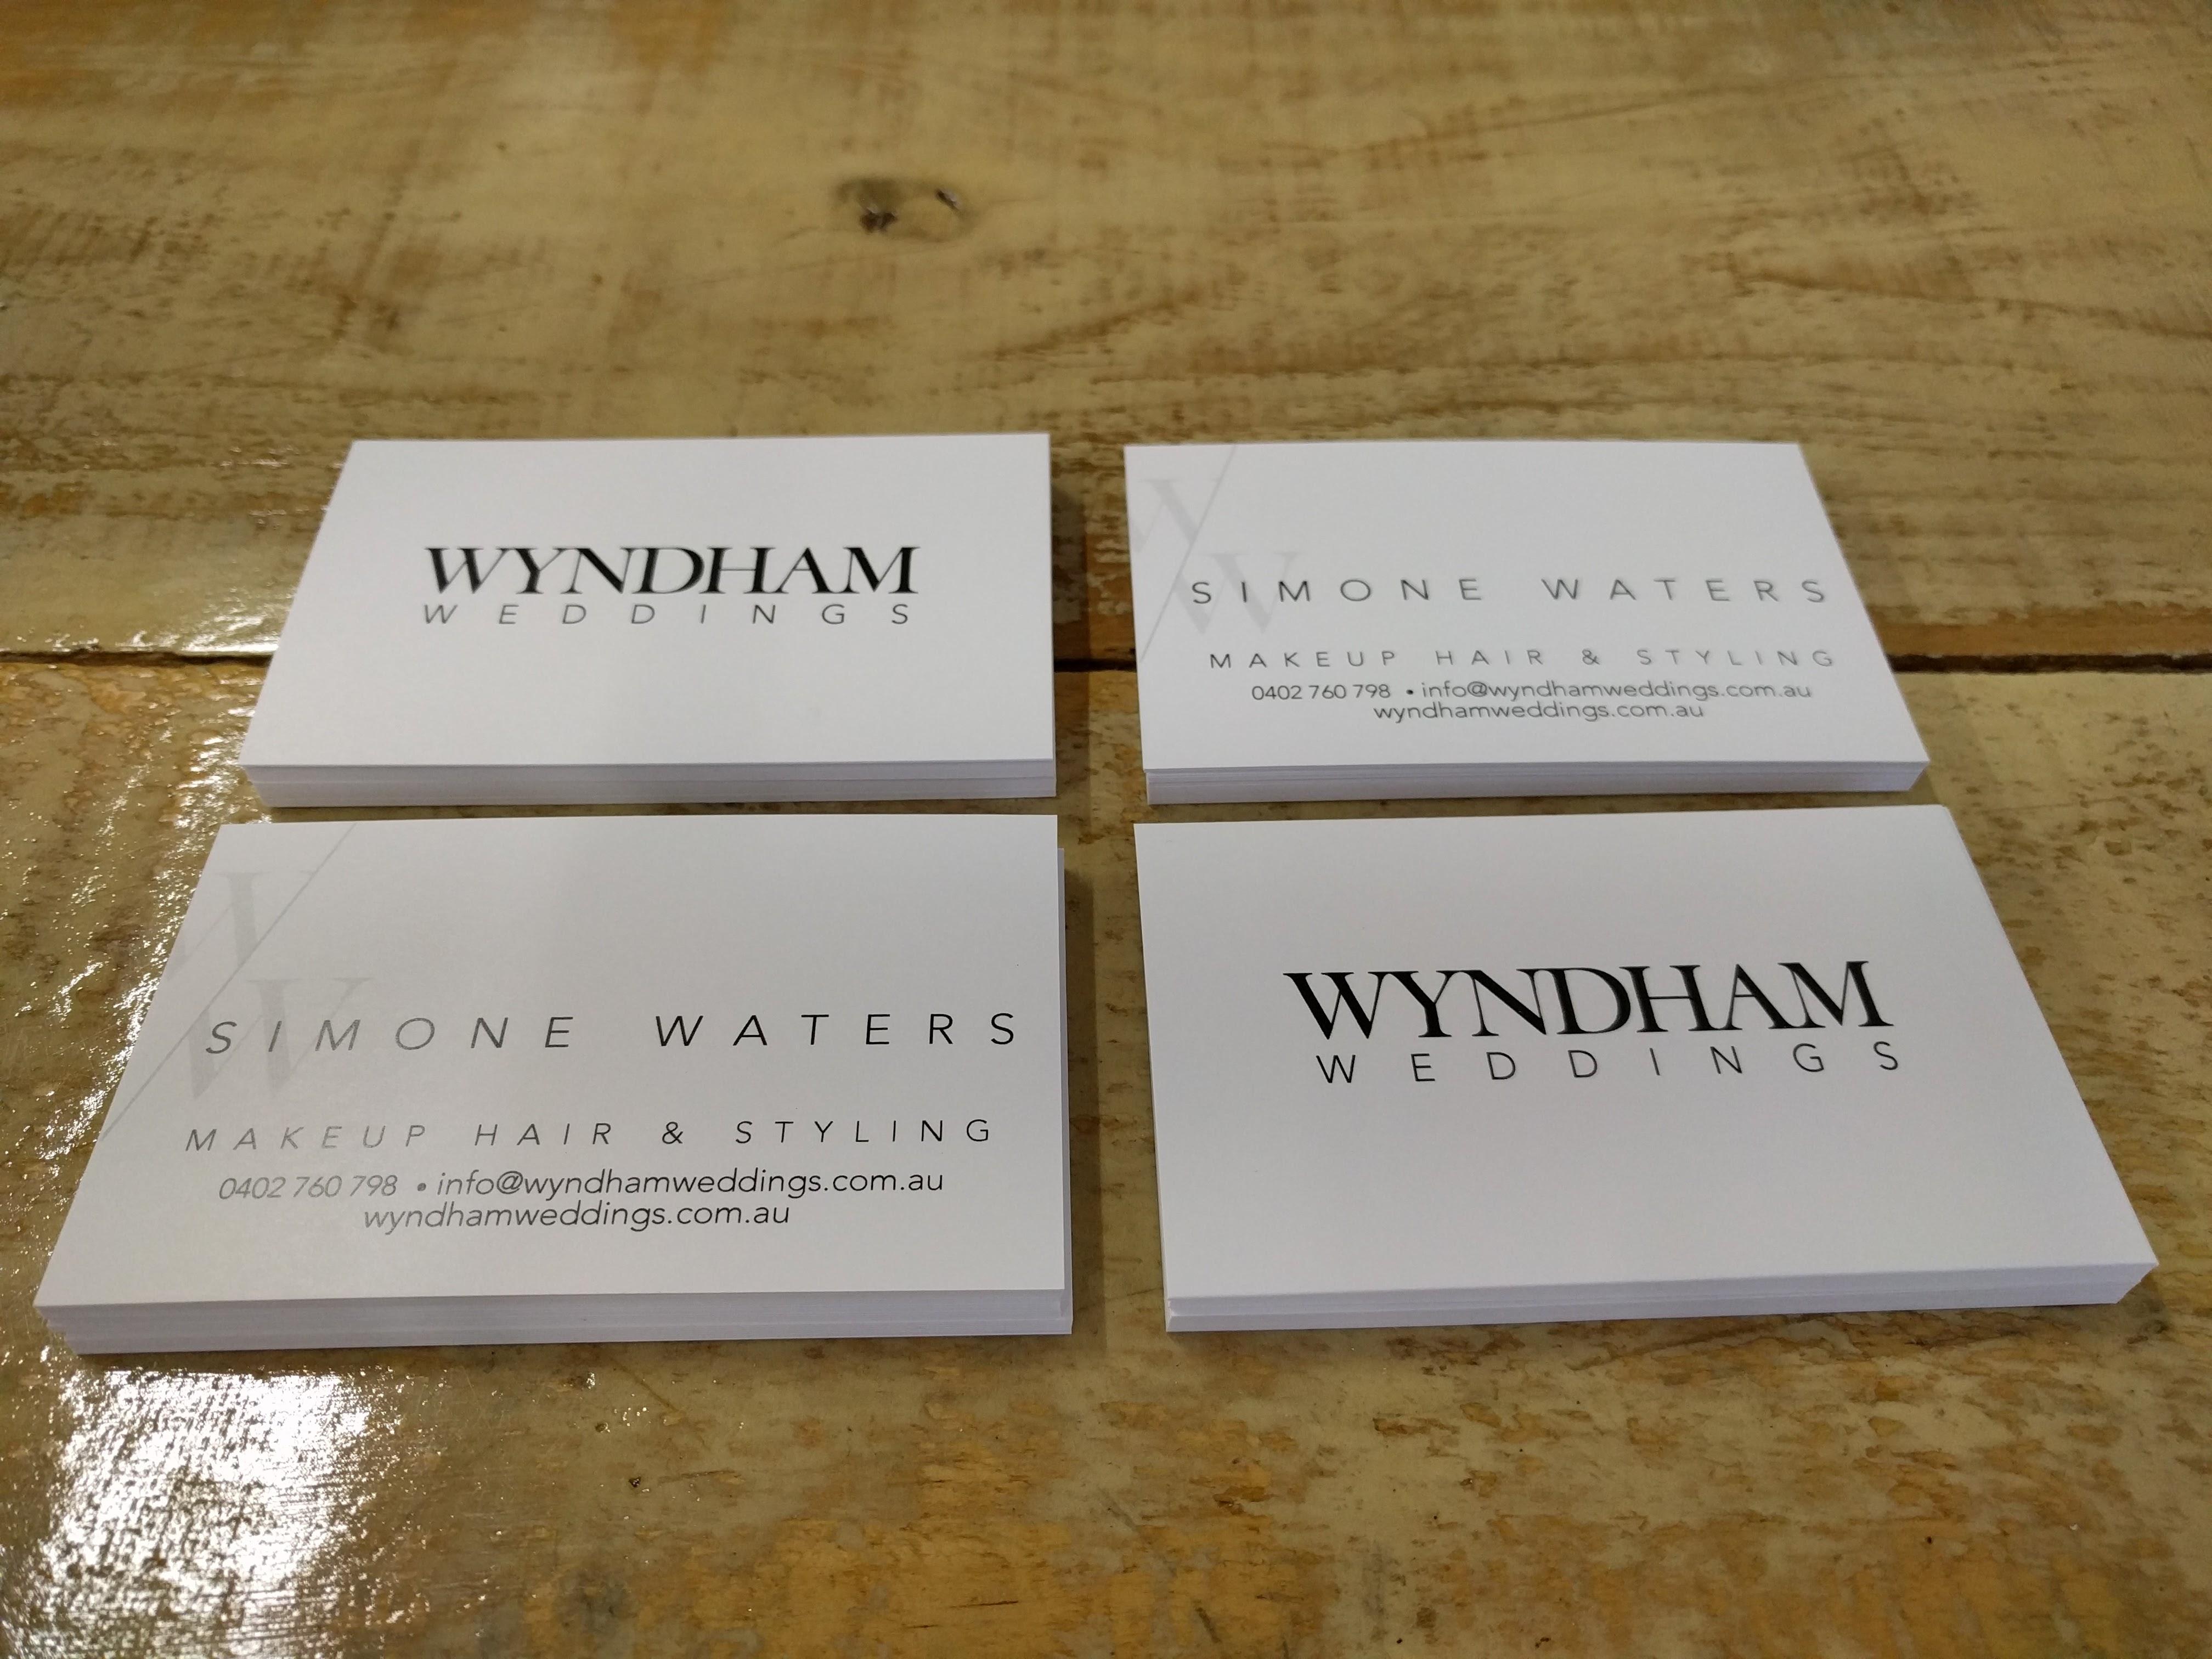 Wyndham Weddings - Volume 2